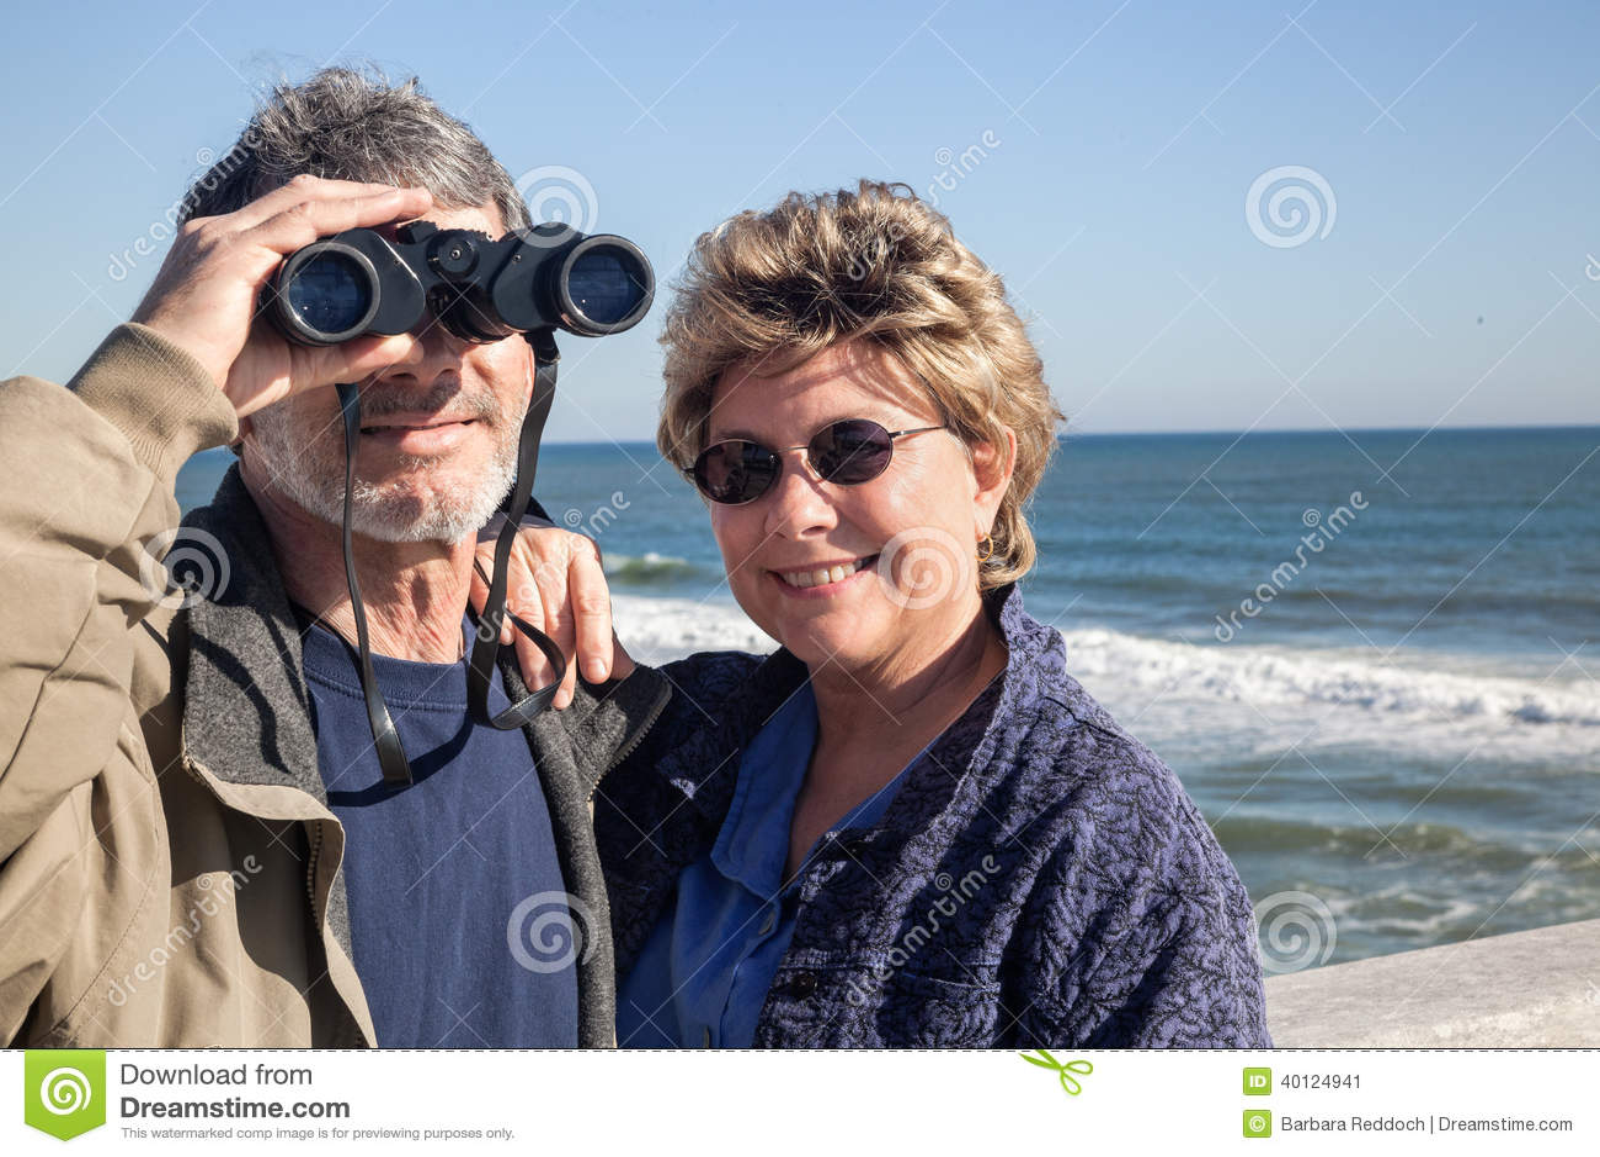 Retired couple on beach vacation with binoculars